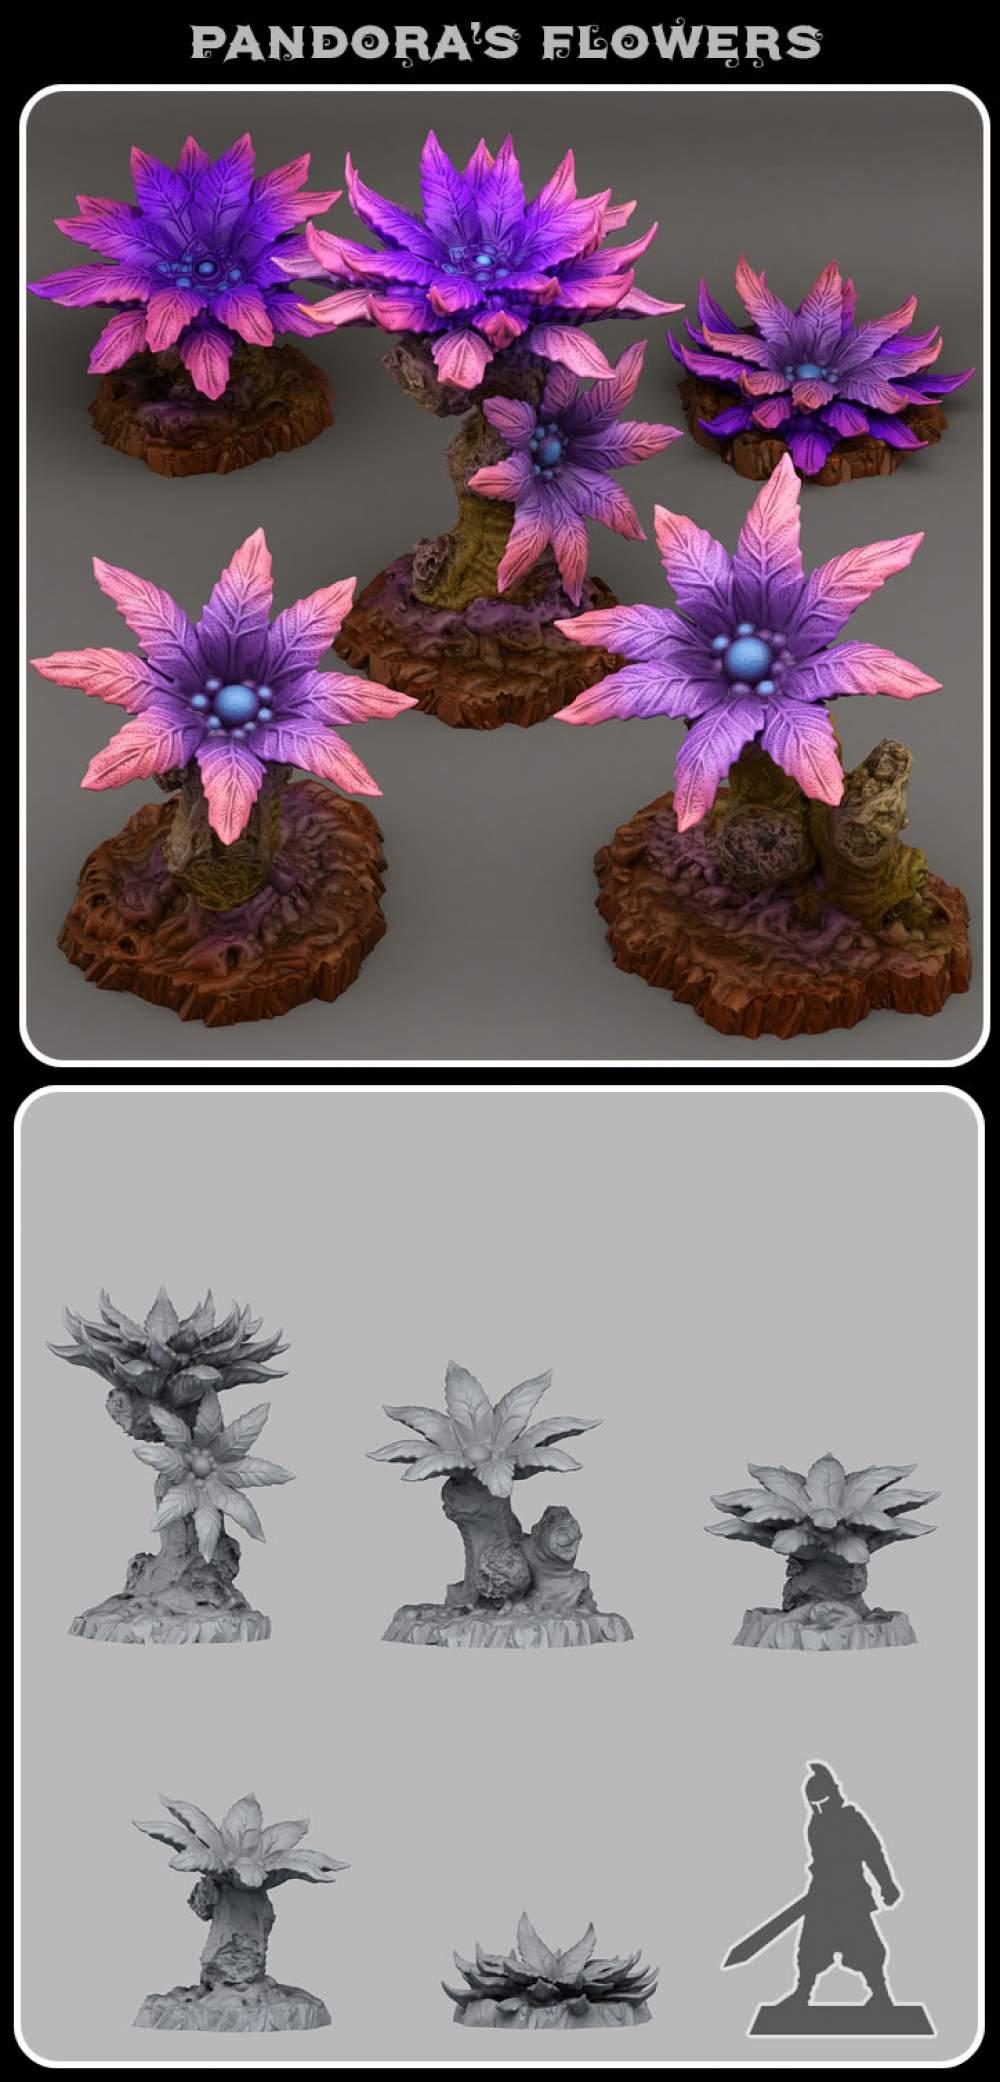 Pandora's flowers